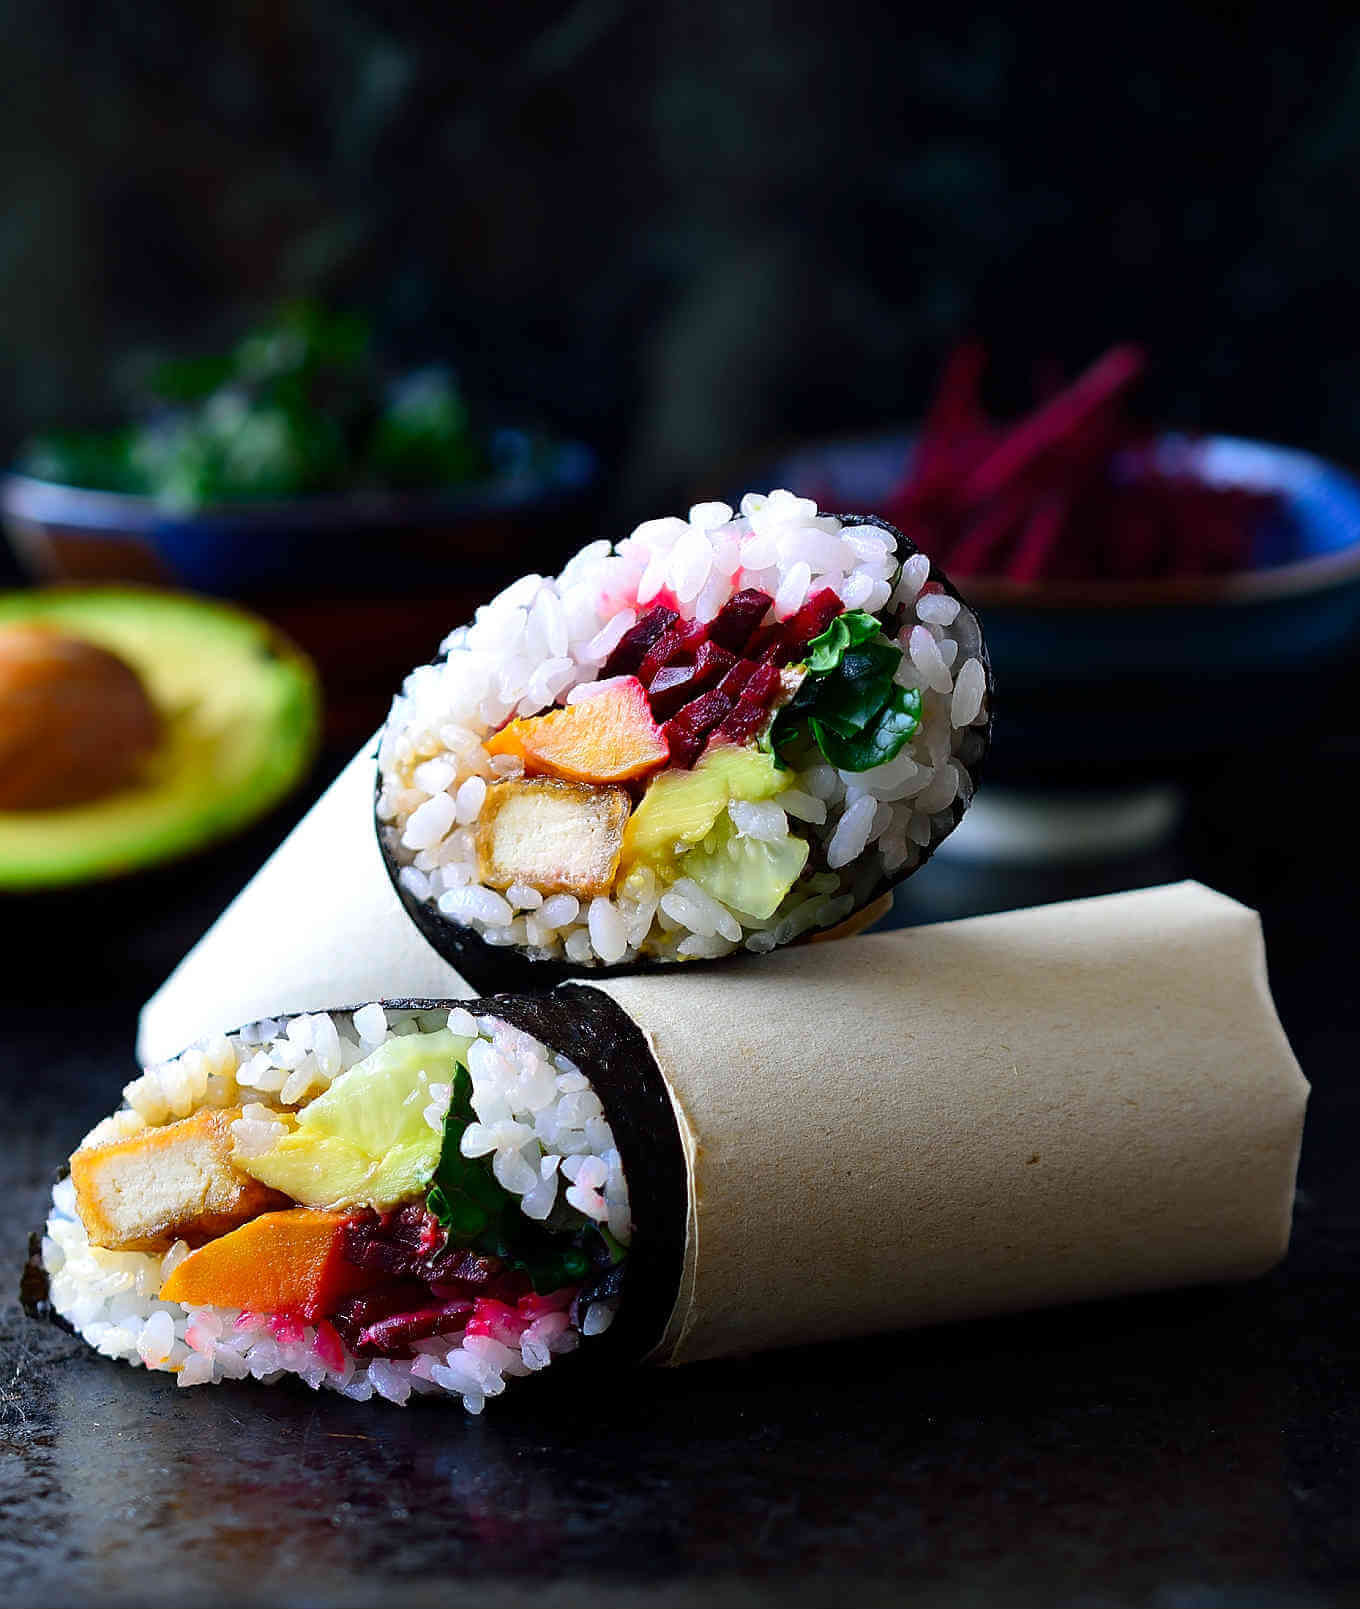 Vegan Sushi Recipes  31 Easy Vegan Sushi Recipes Healthy Homemade